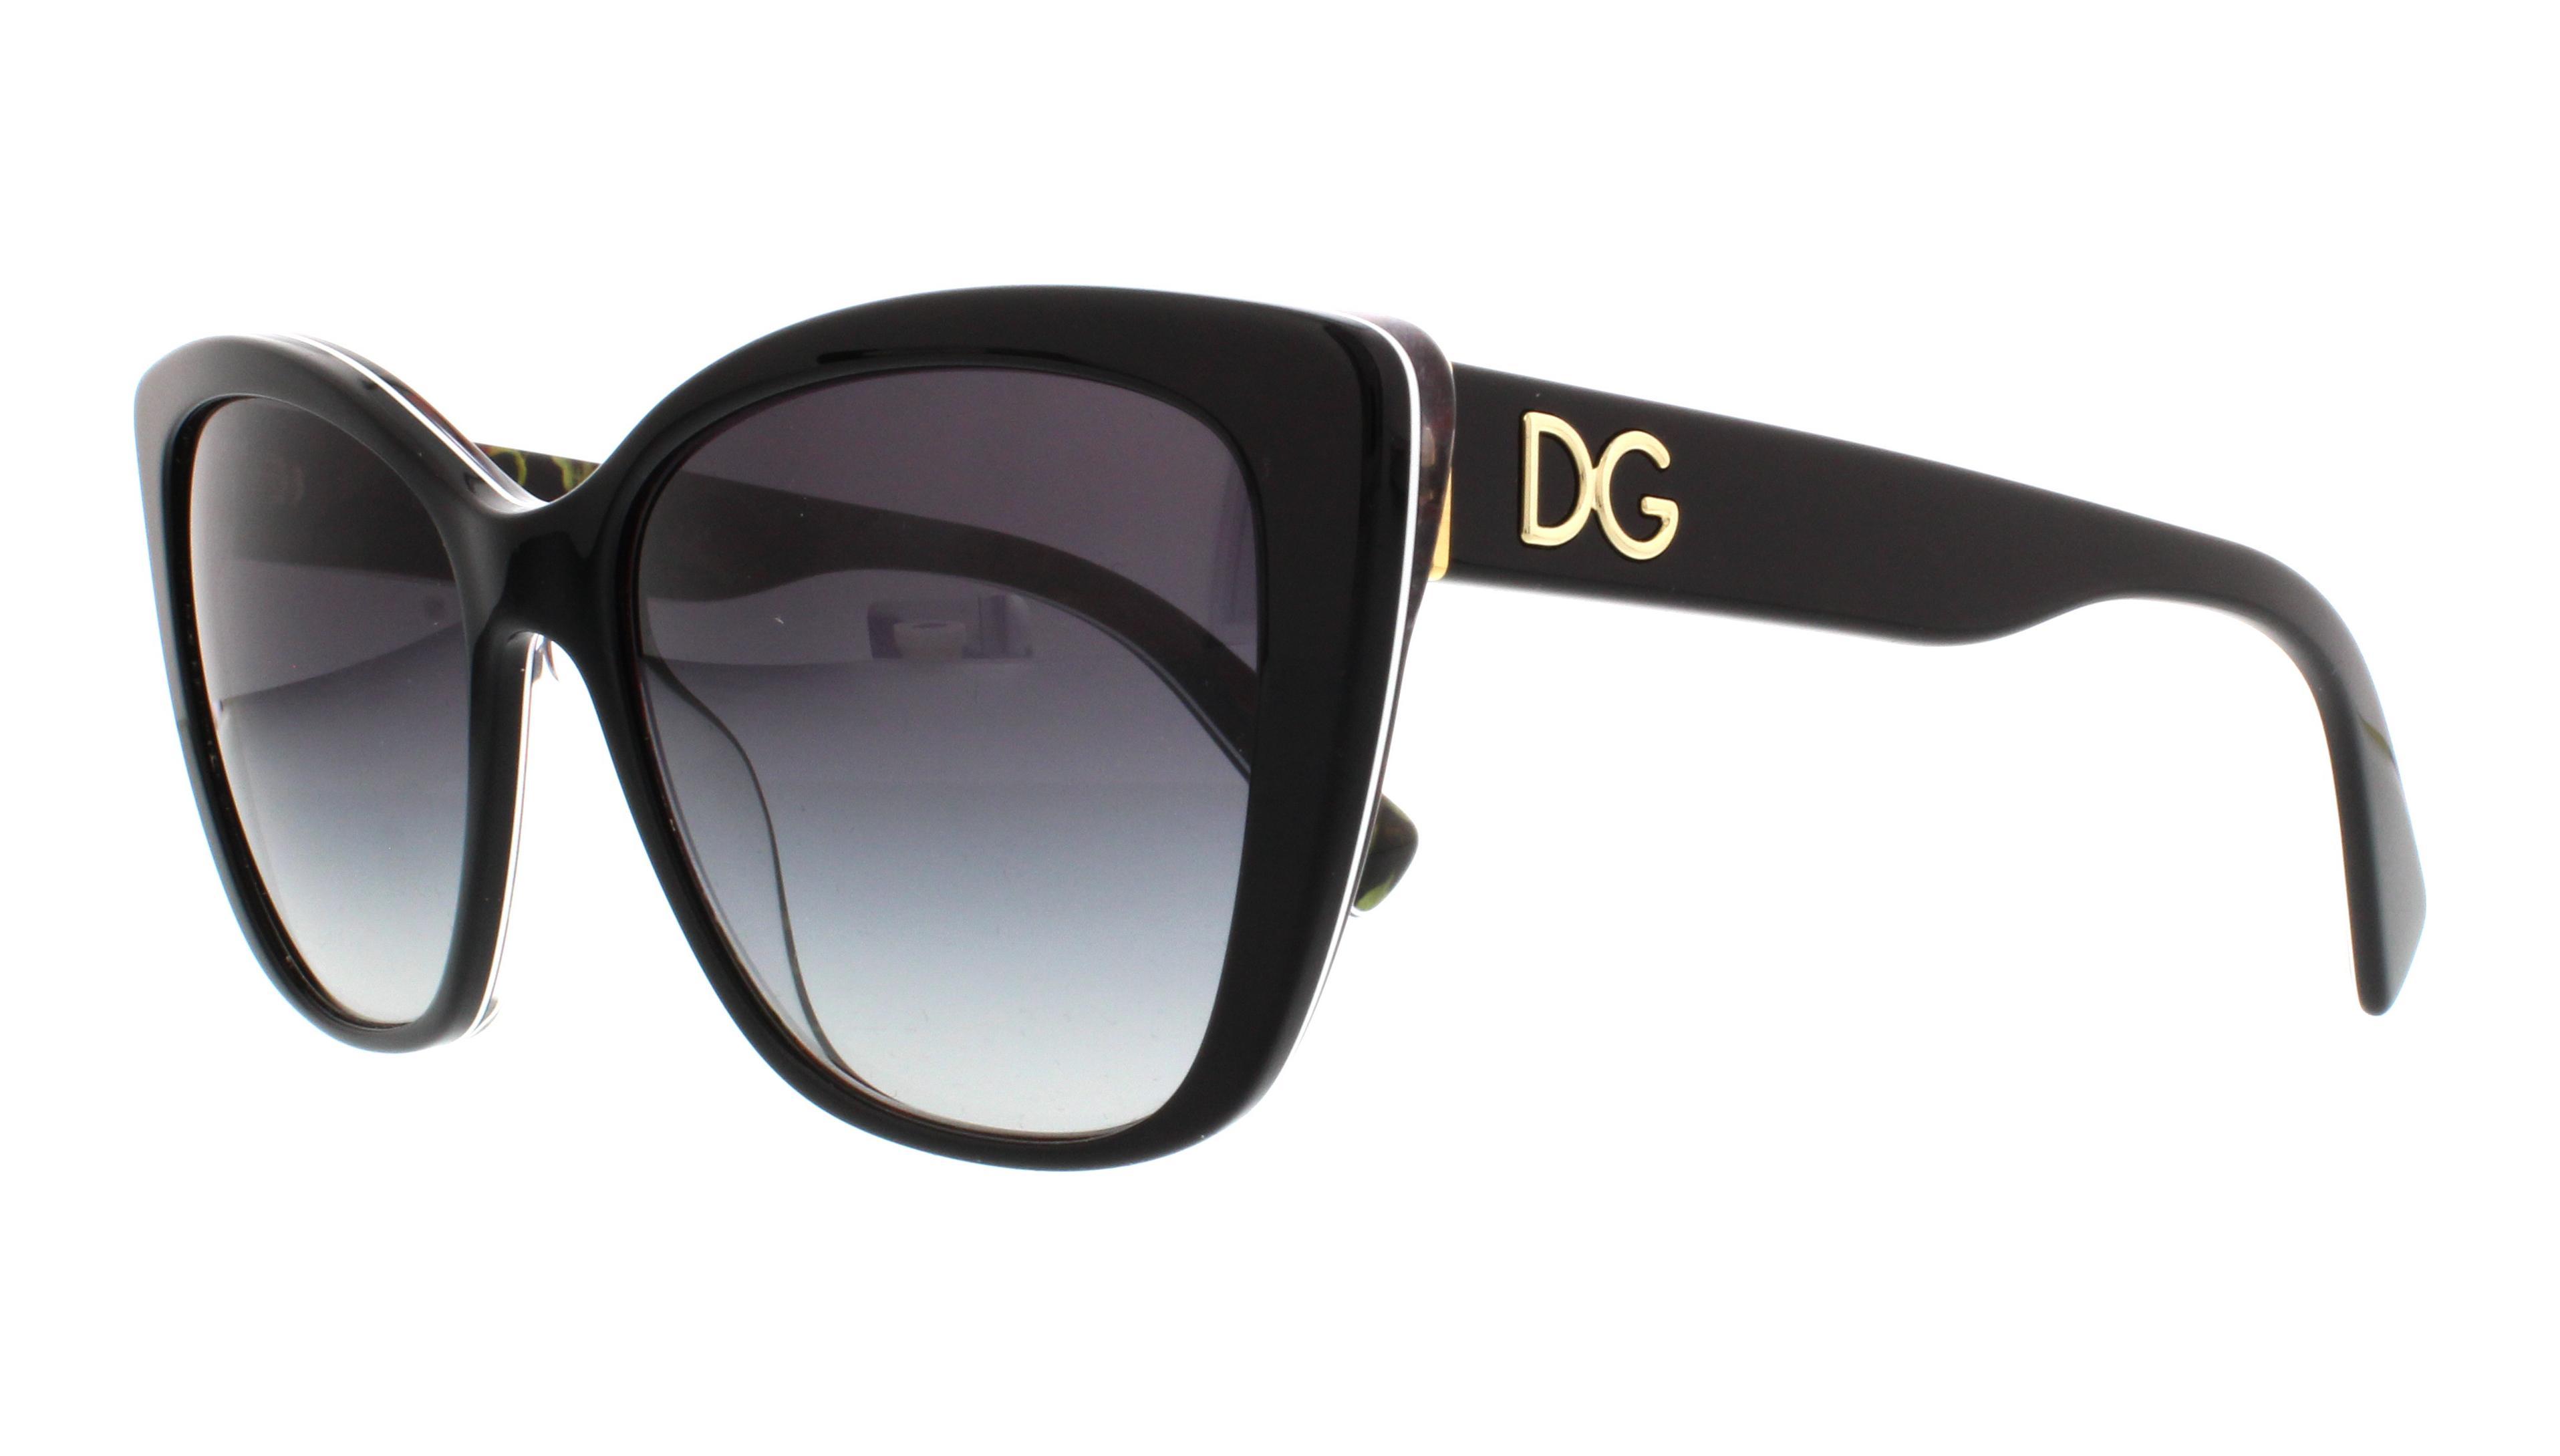 29408g black on printing roses - Dolce And Gabbana Frames